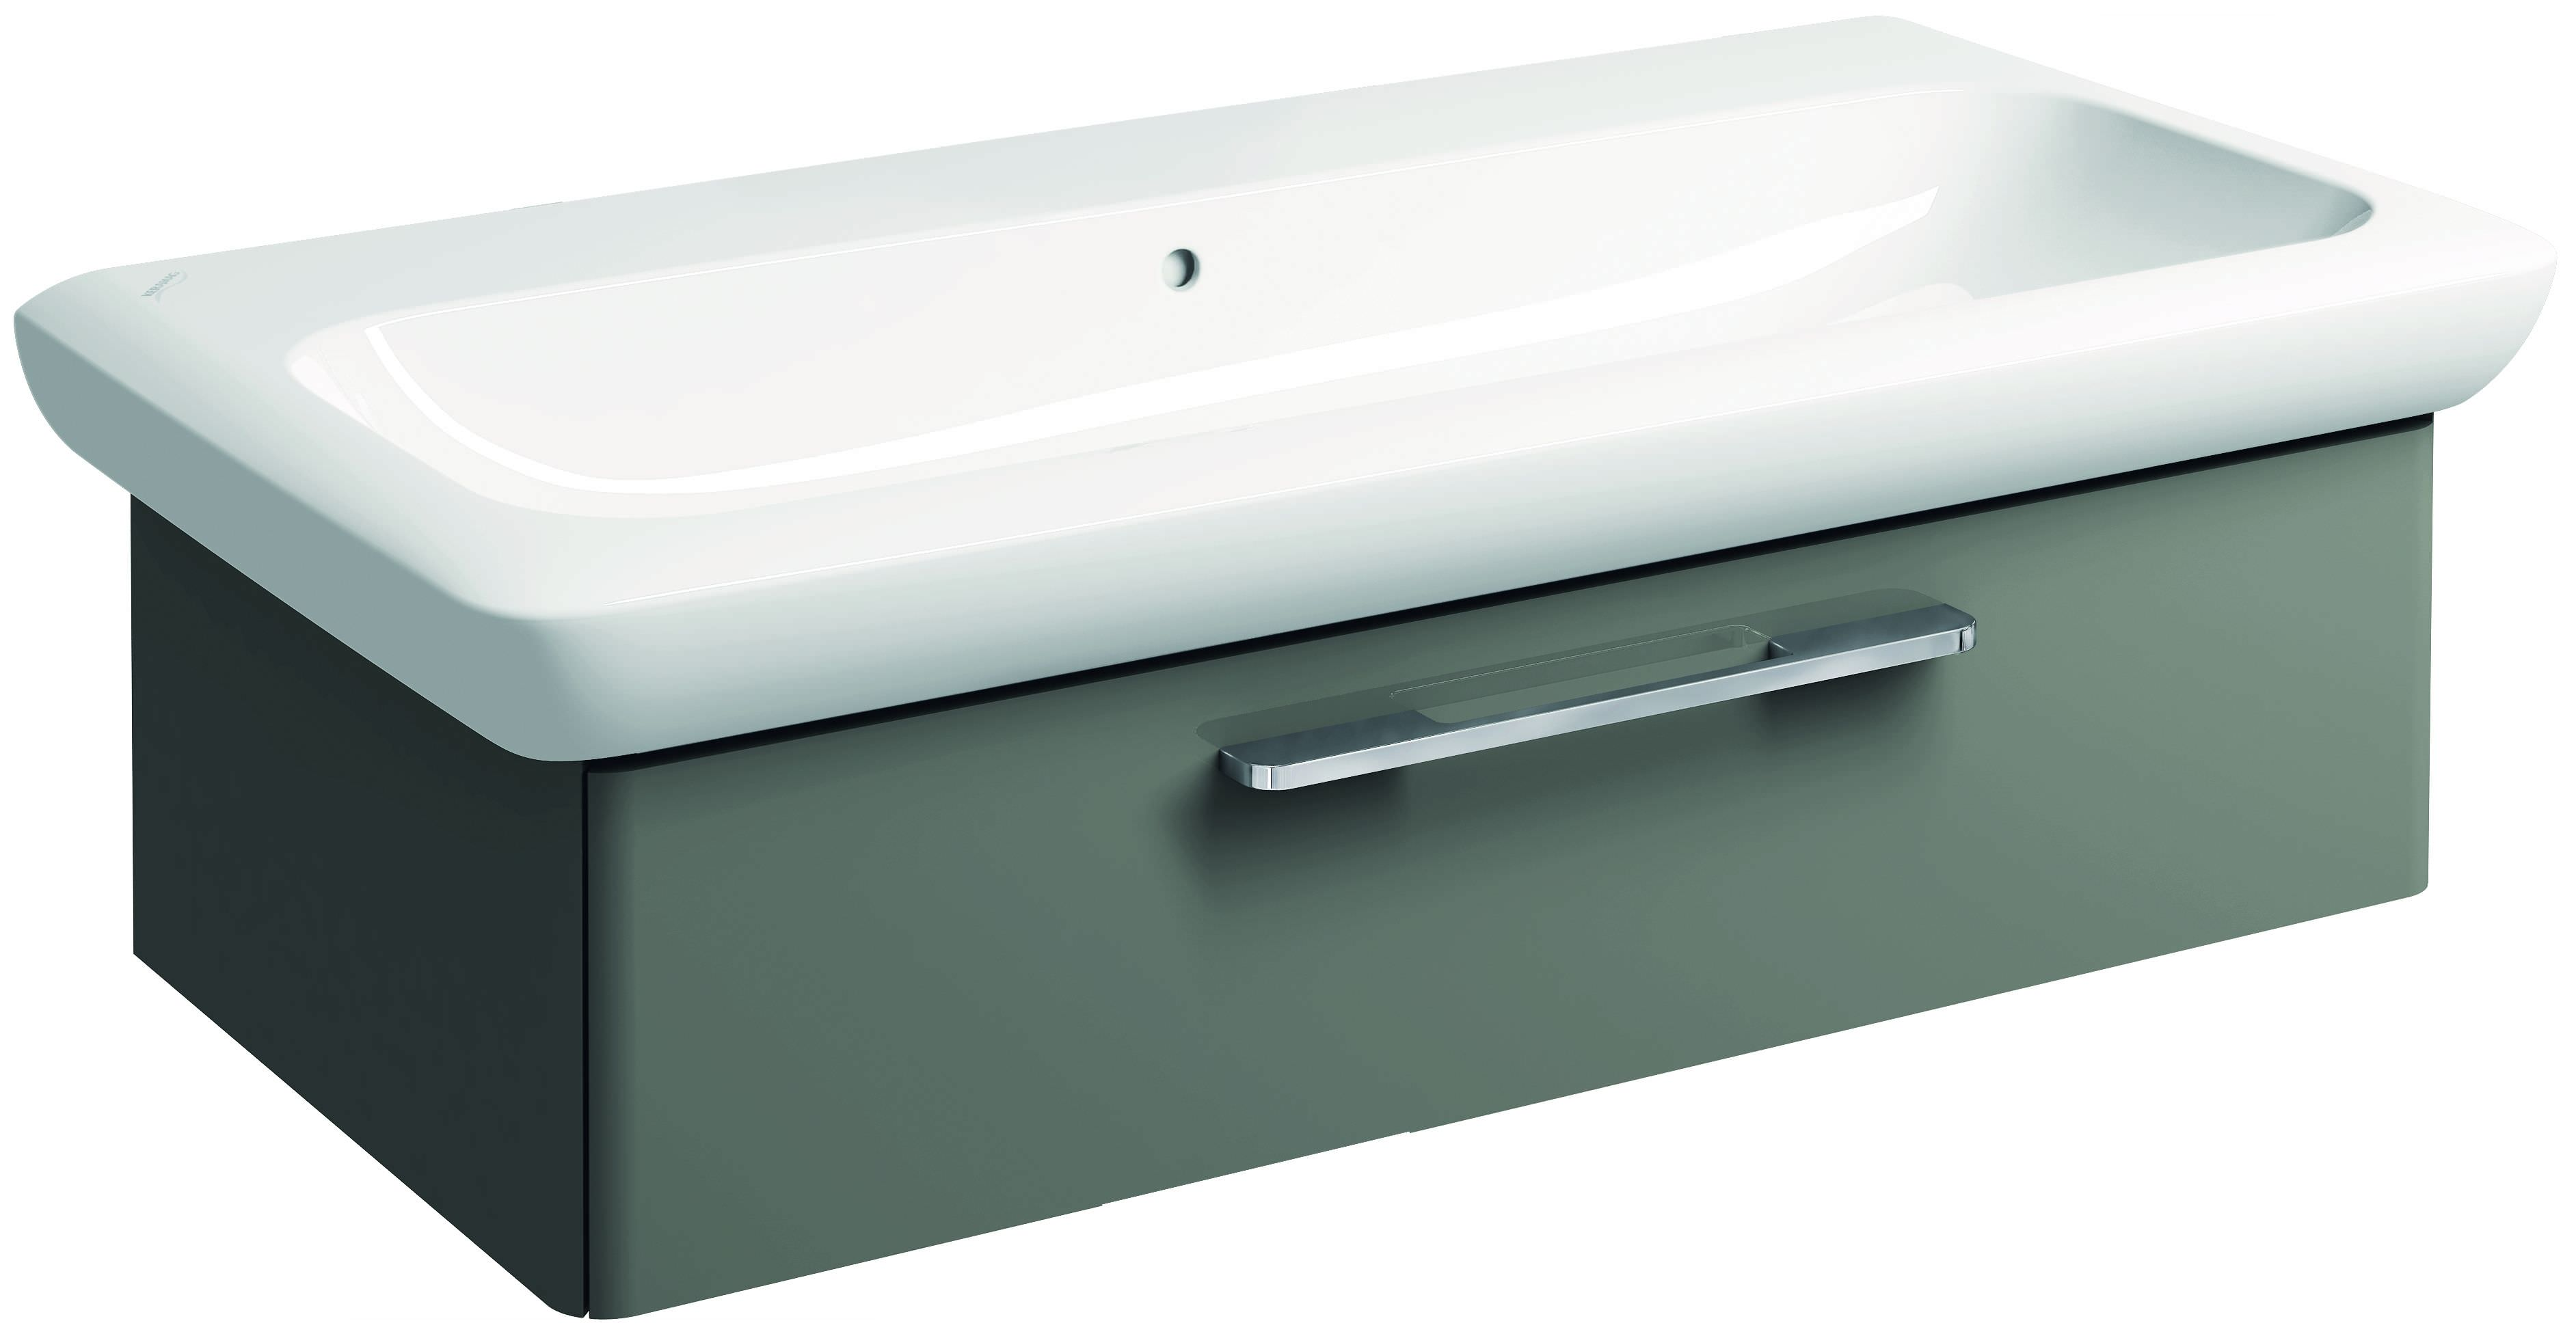 keramag it waschtischunterschrank 900x219x434mm. Black Bedroom Furniture Sets. Home Design Ideas